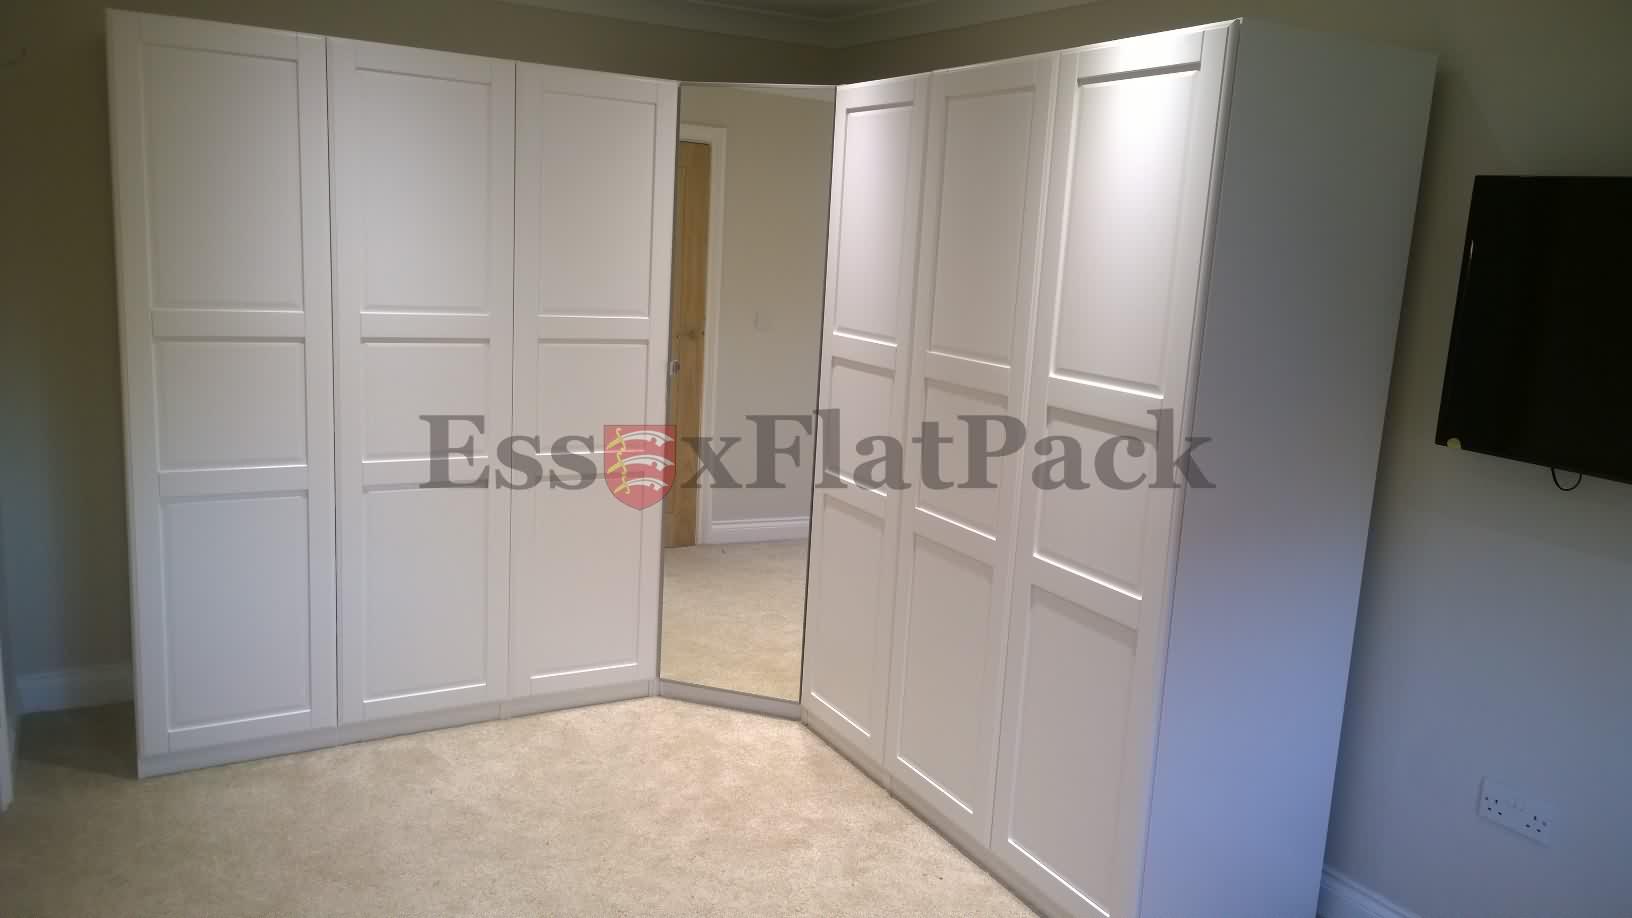 essexflatpack-furniture-20160119154356.jpg